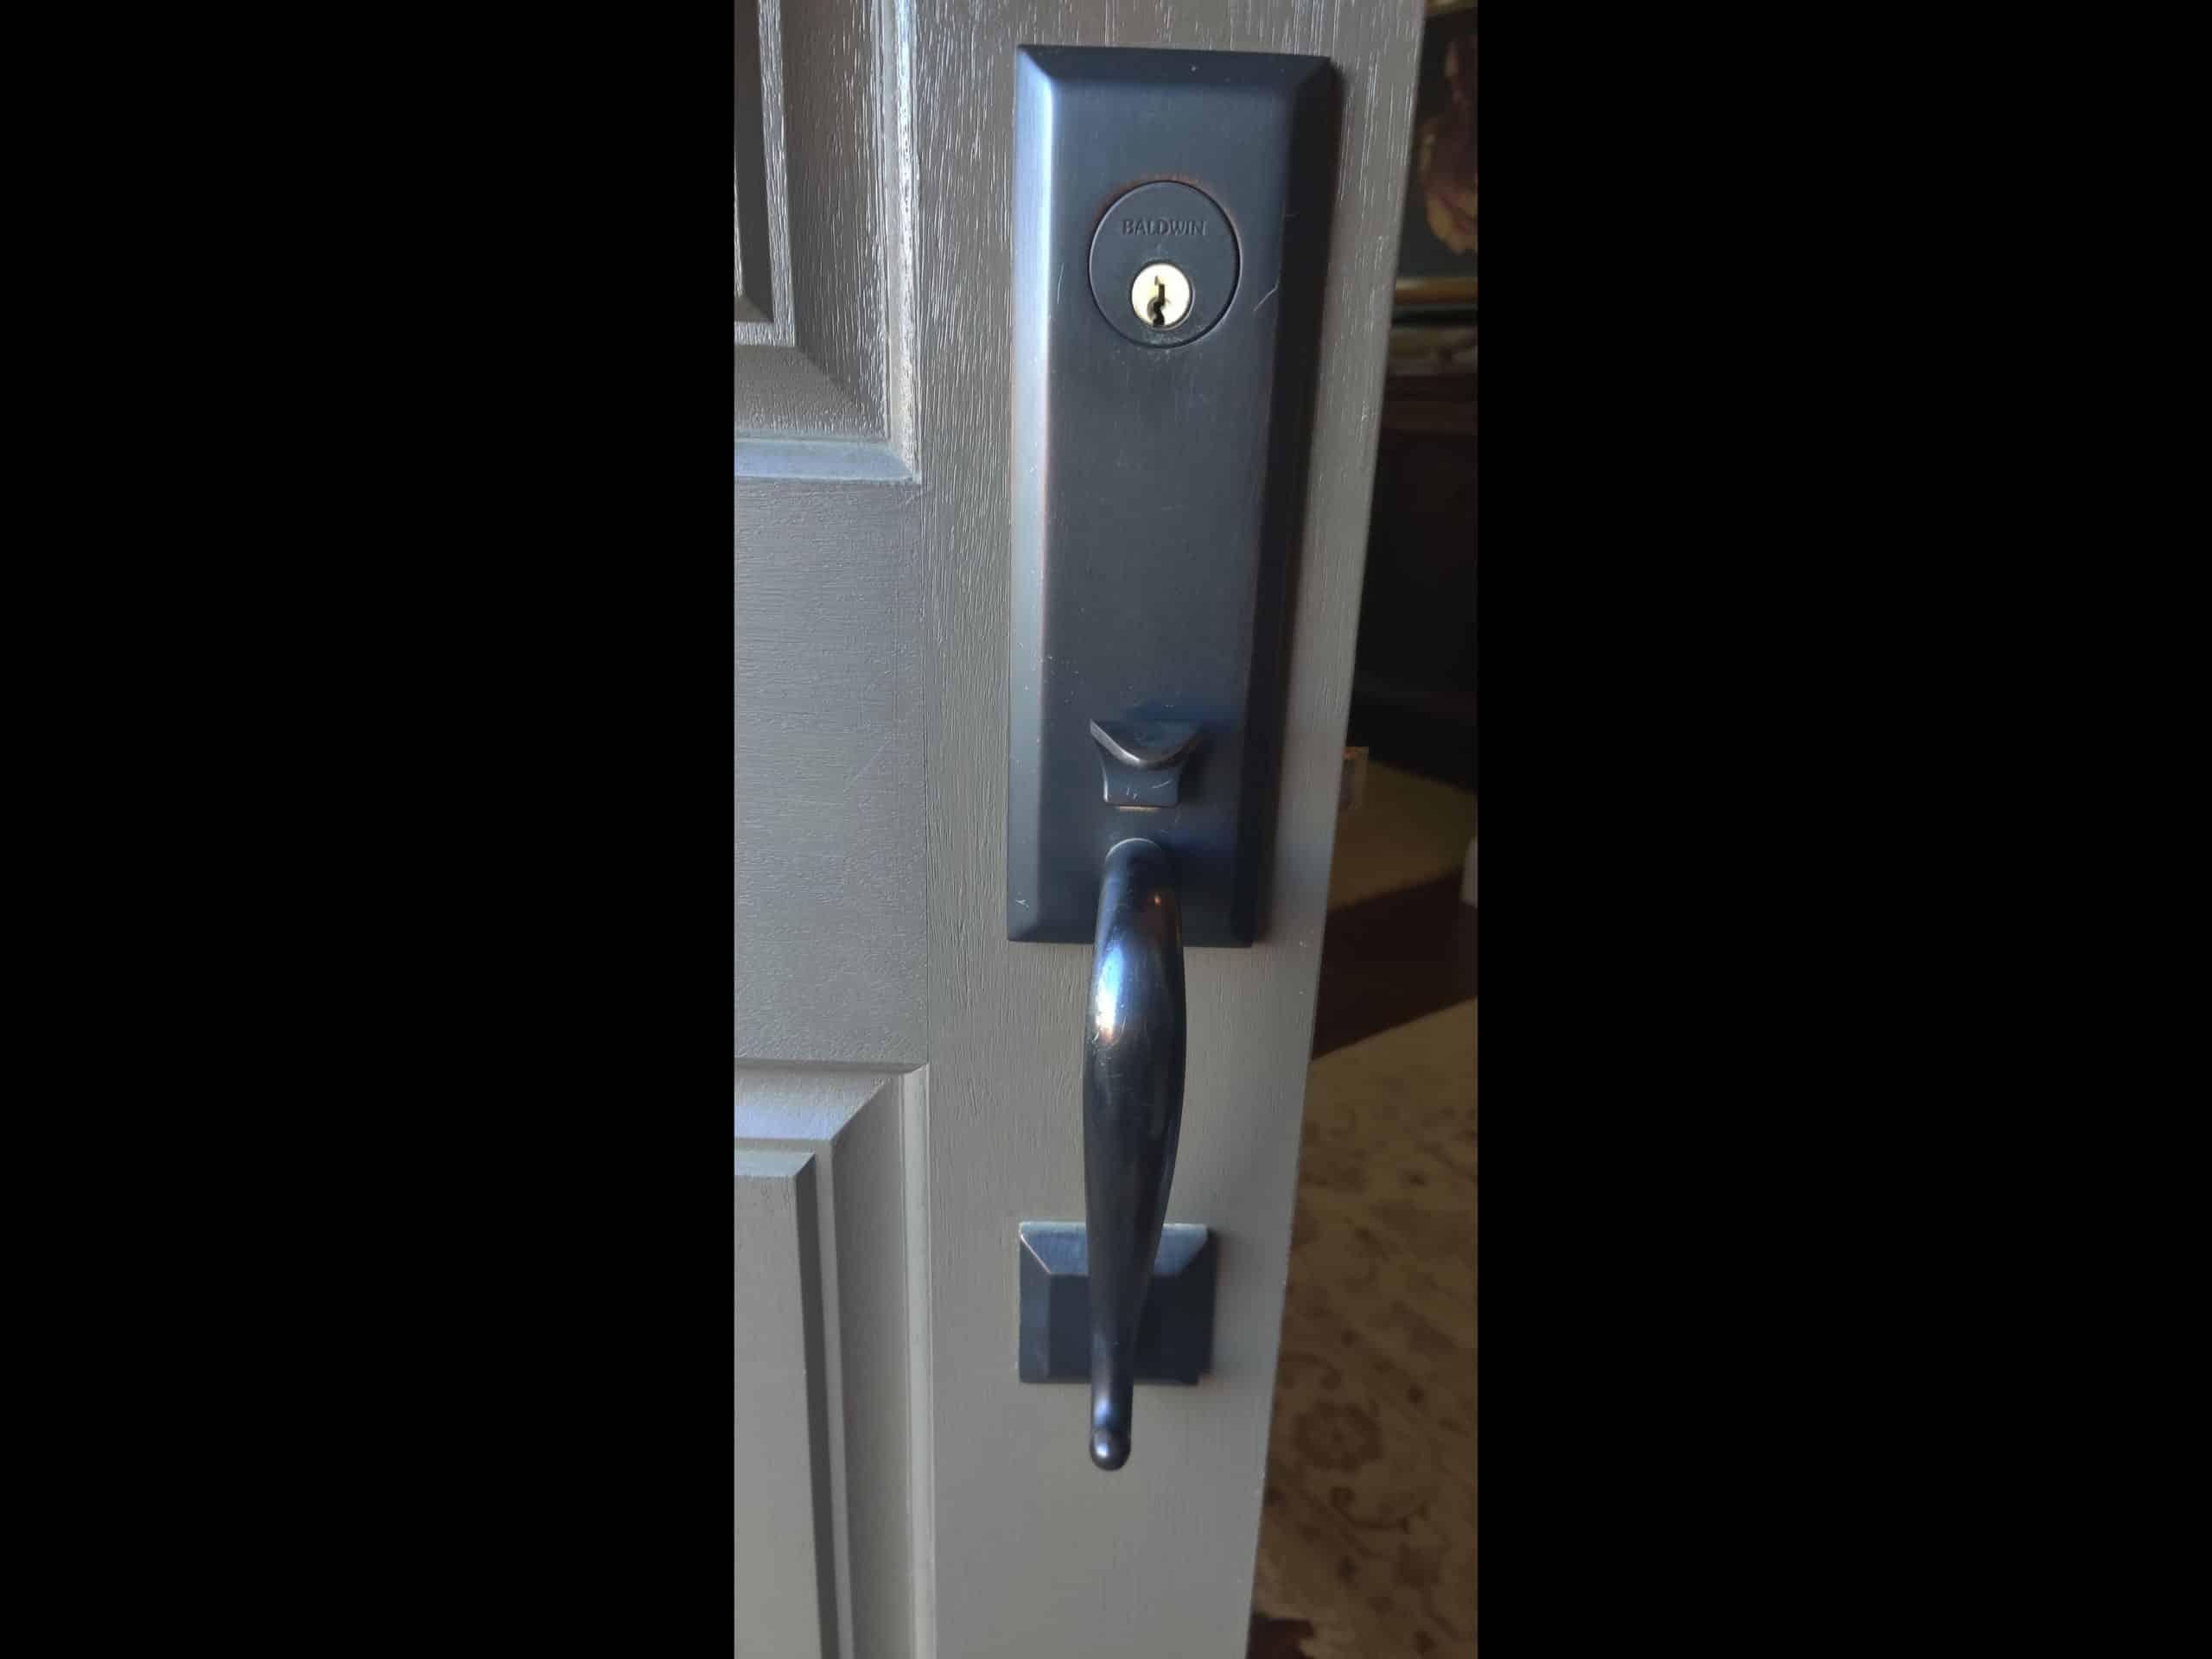 locksmith services dublin, CA   LocksmithonWheels